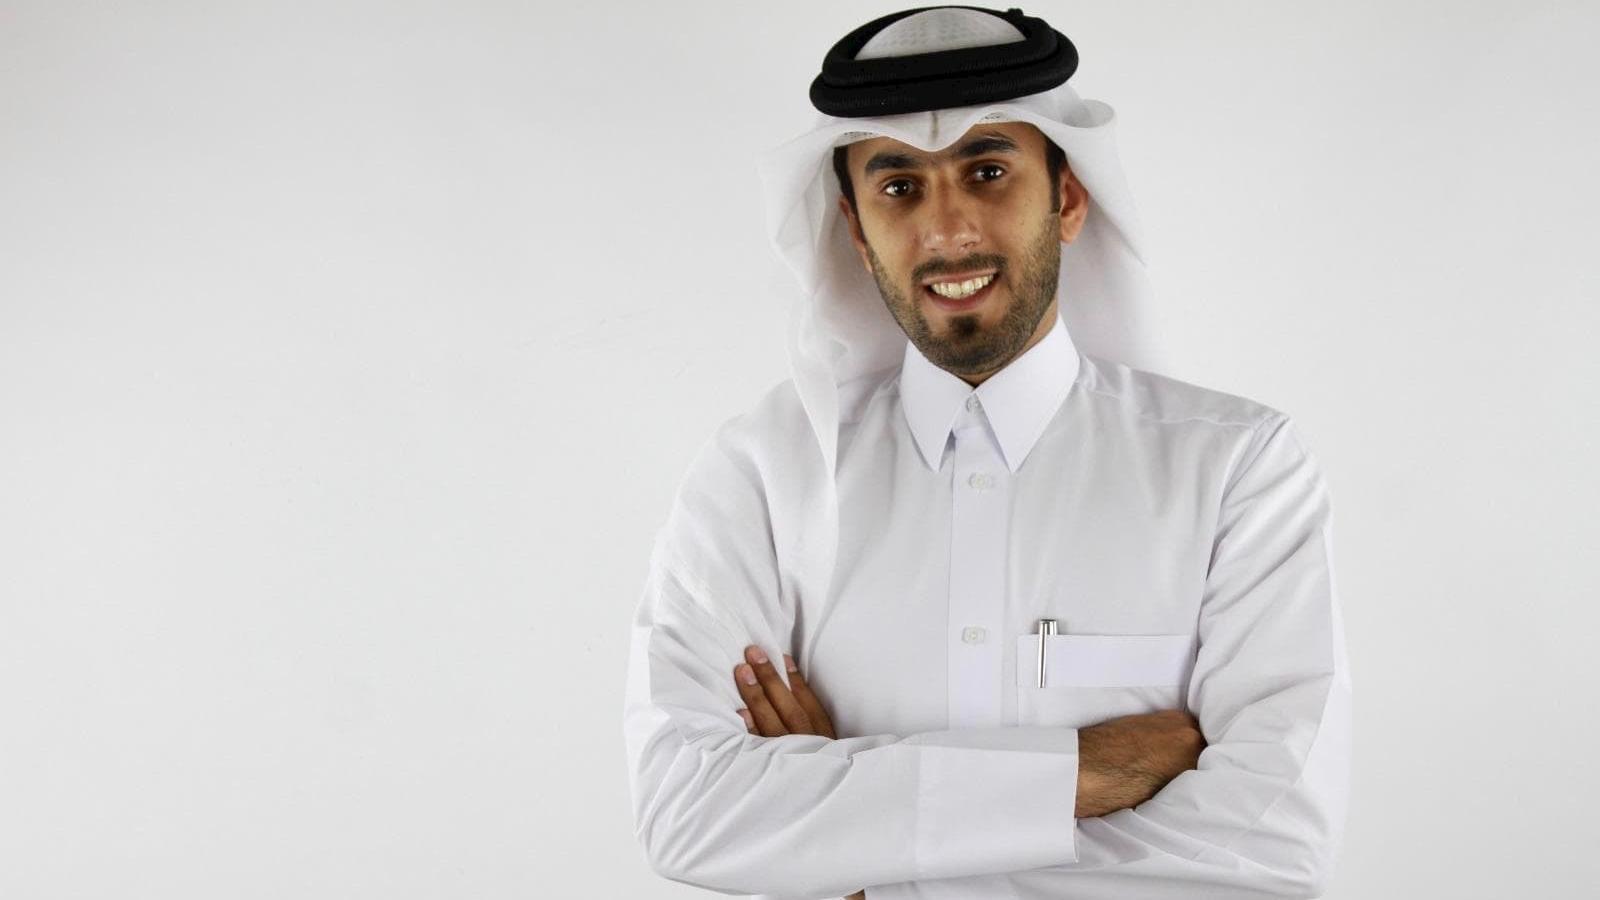 WATCH: QL Exclusive: An interview with Qatari engineer and entrepreneur Khalid Aboujassoum